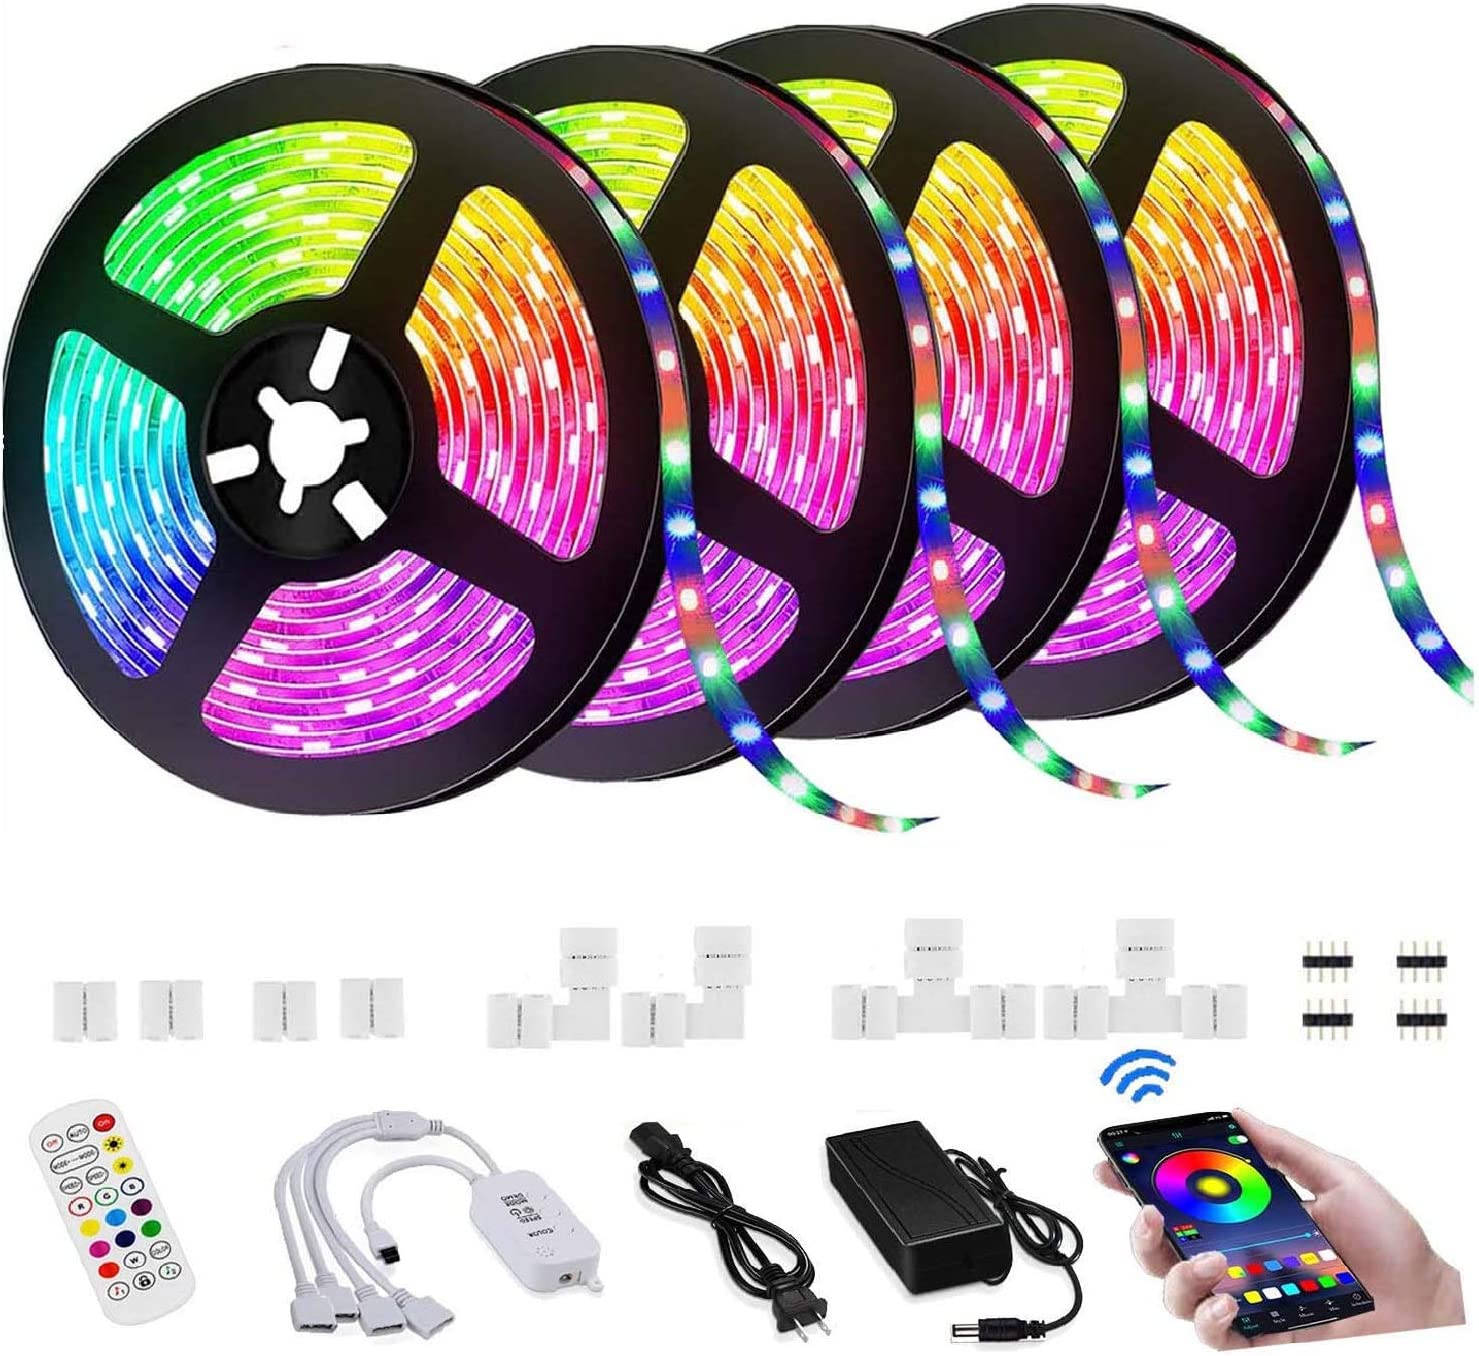 LED Strip Lights, 65.6FT/20M RGB Strip Lights Music Sync,Smart App Control,Remote,5050 RGB LED Light Strip Color Changing,Sensitive Built-in Mic,LED Strip Light for Home TV Party,Bedroom,Kitchen